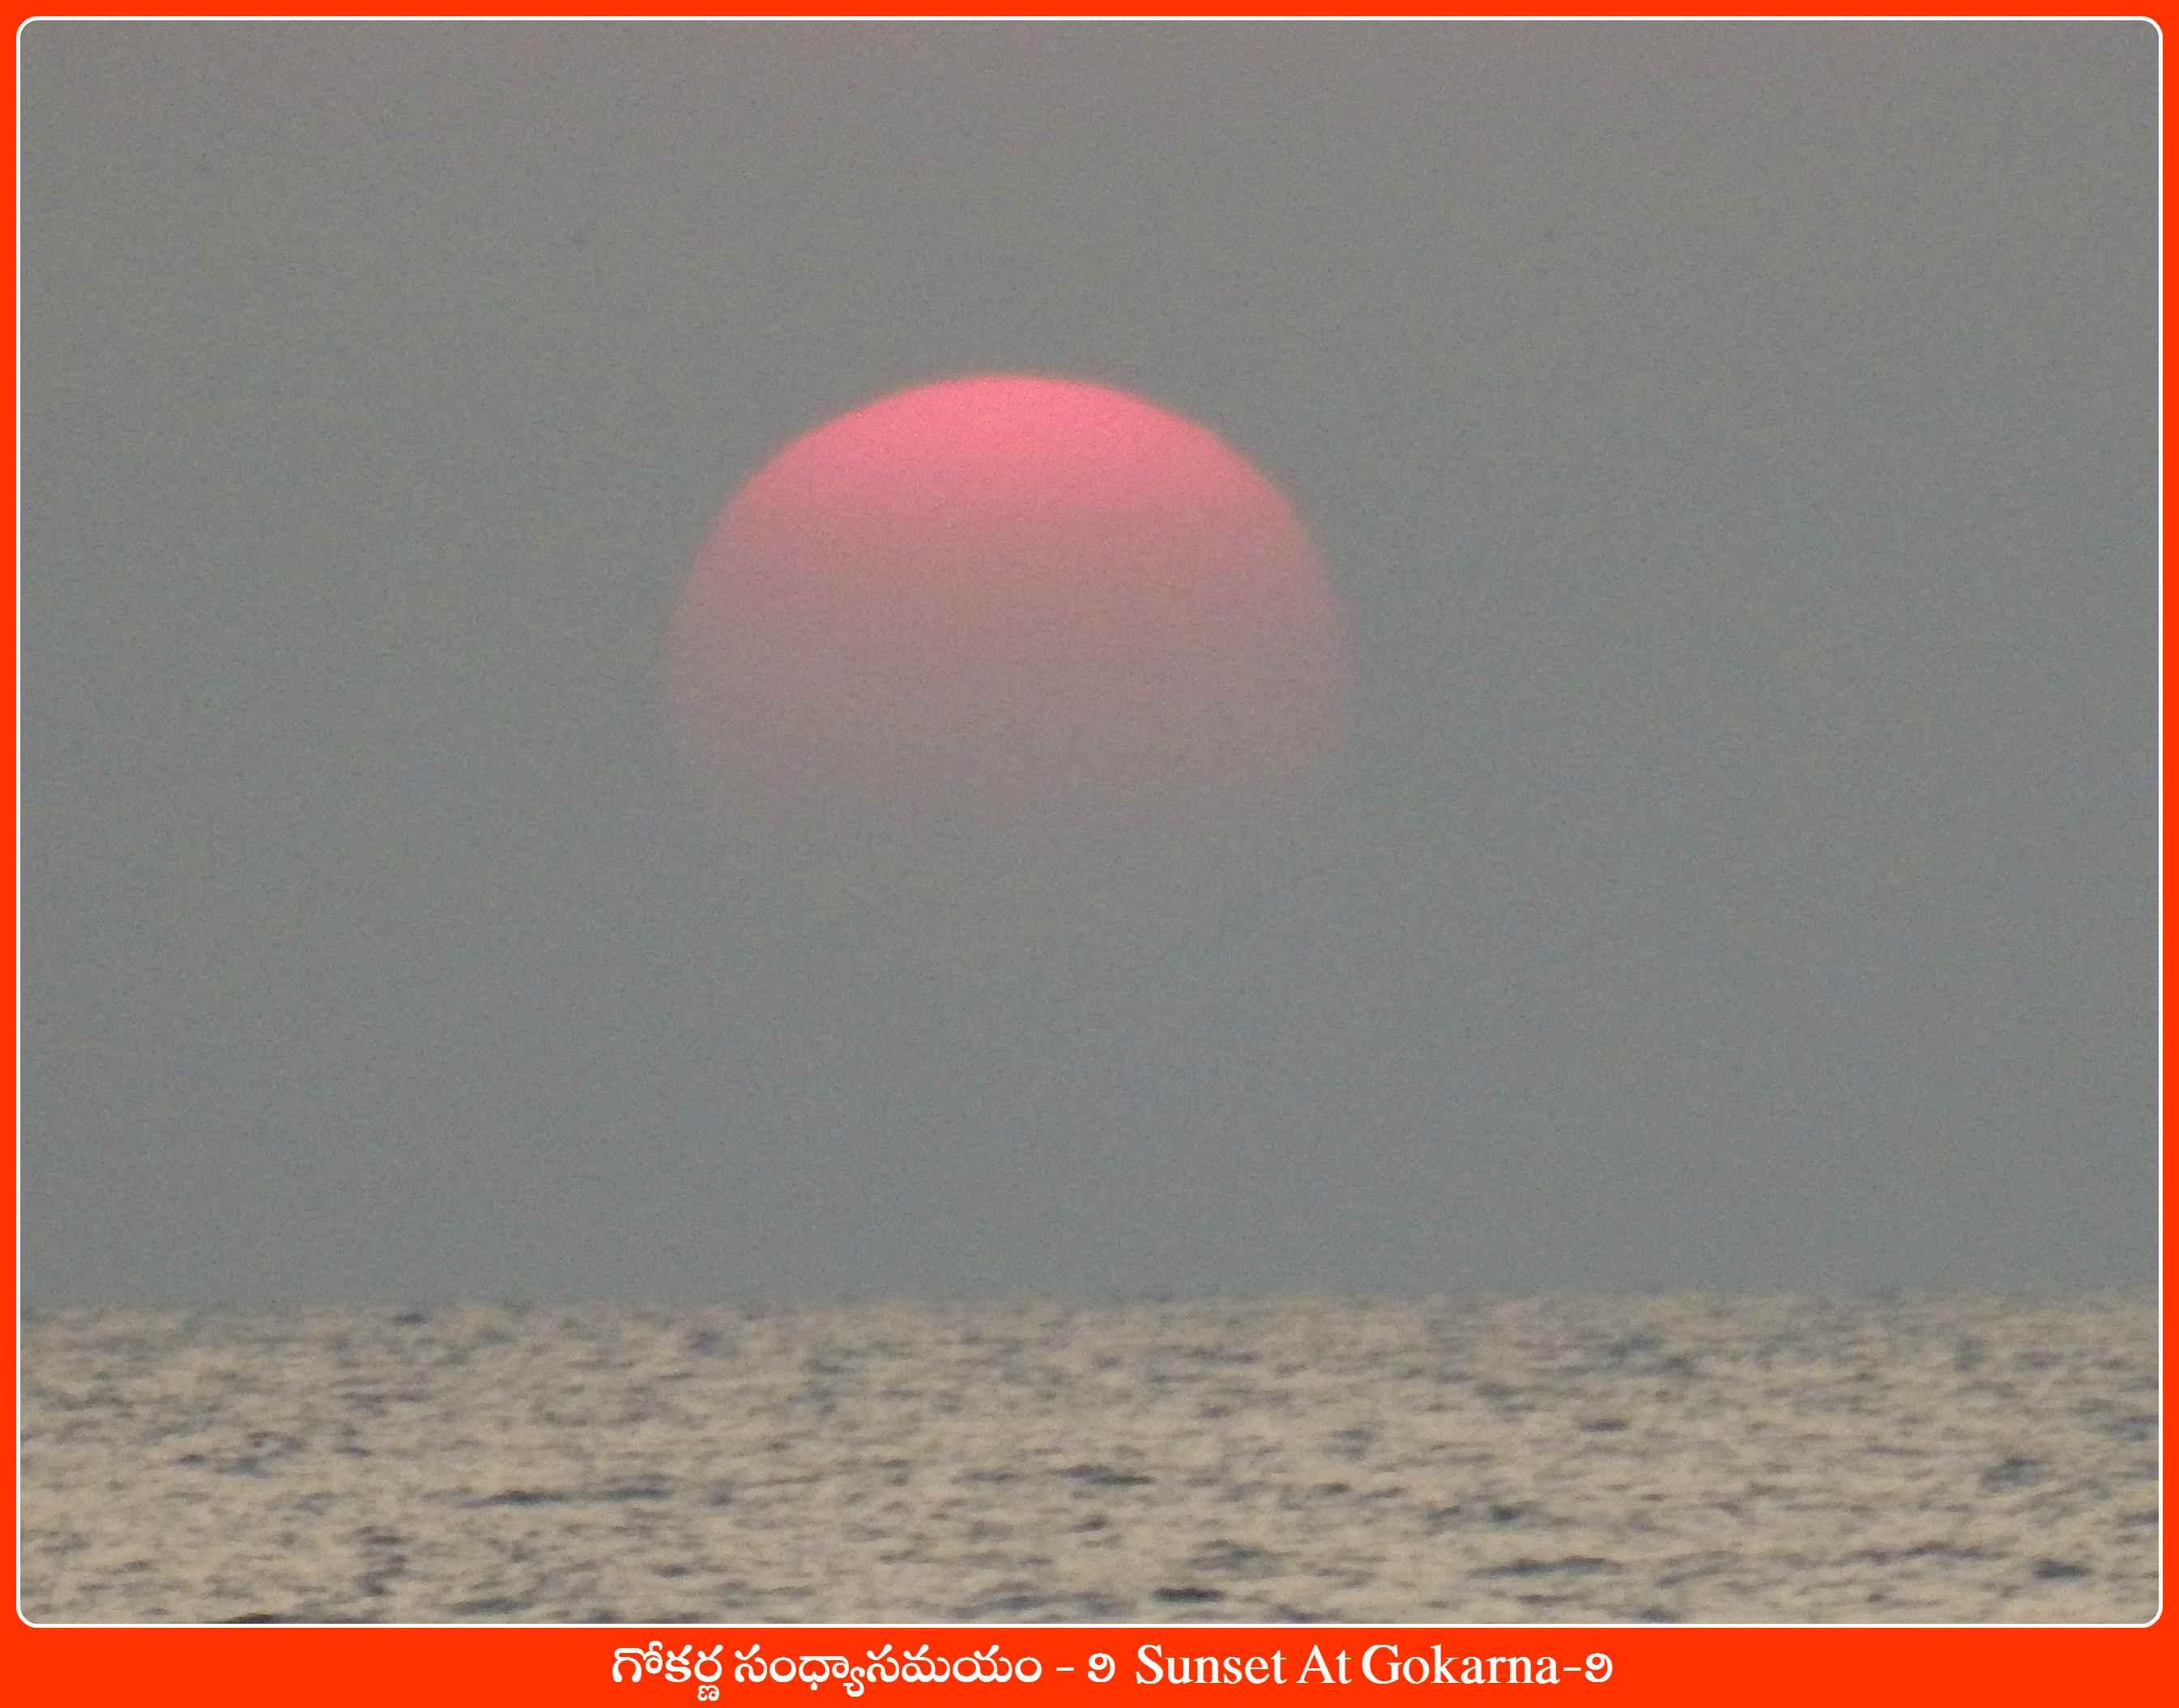 Sunset At Gokarna-9